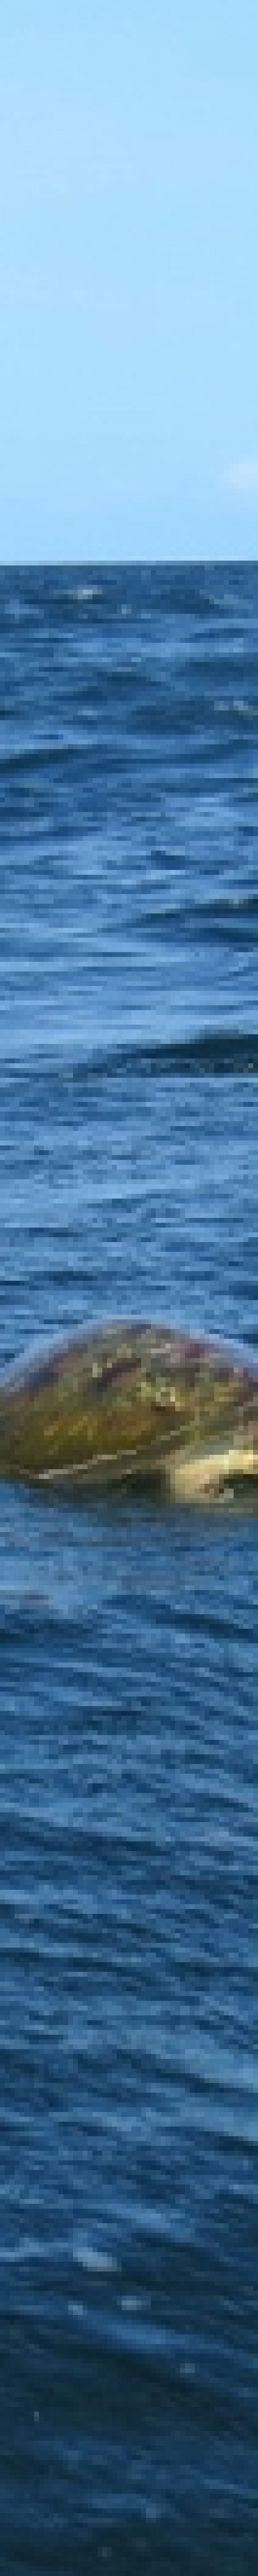 Green turtle - Kiunga Marine National Reserve Copyright Maya Mangat